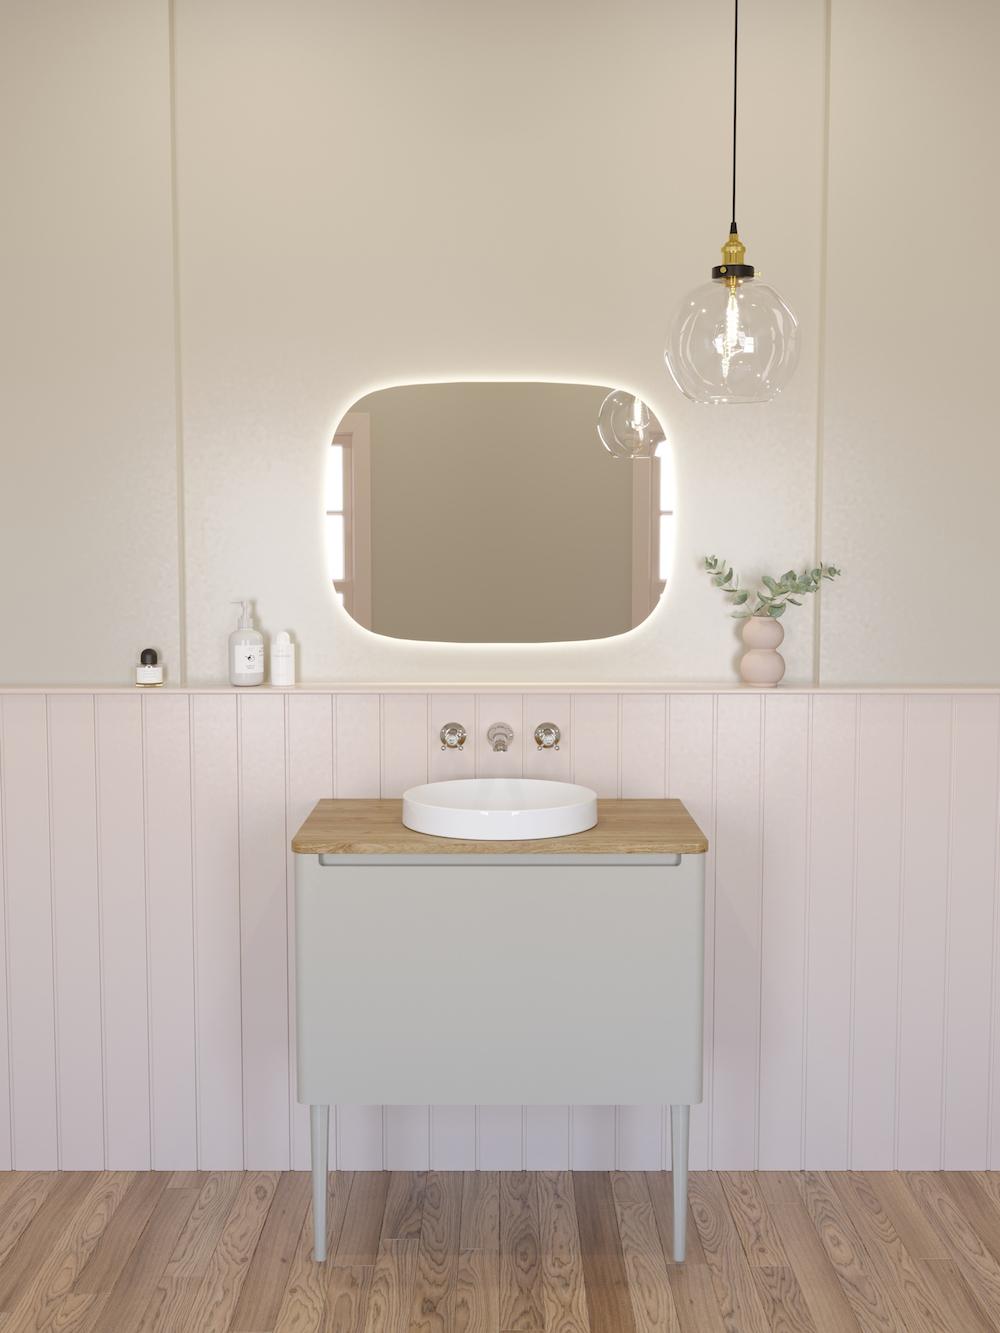 A muted bathroom scene